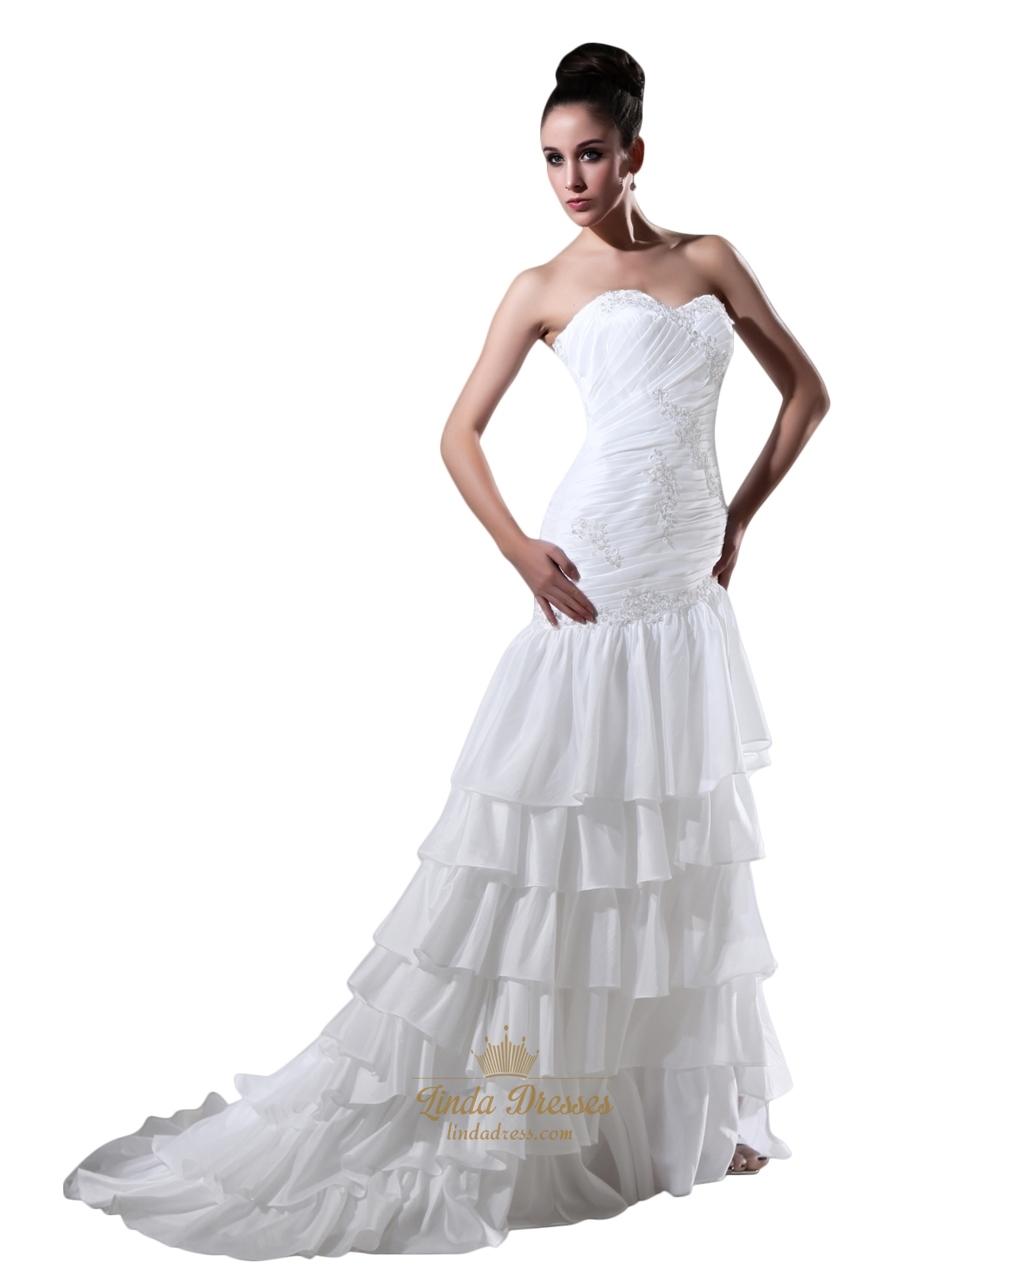 White Taffeta Layered Skirt Mermaid Wedding Dress With Lace Liques